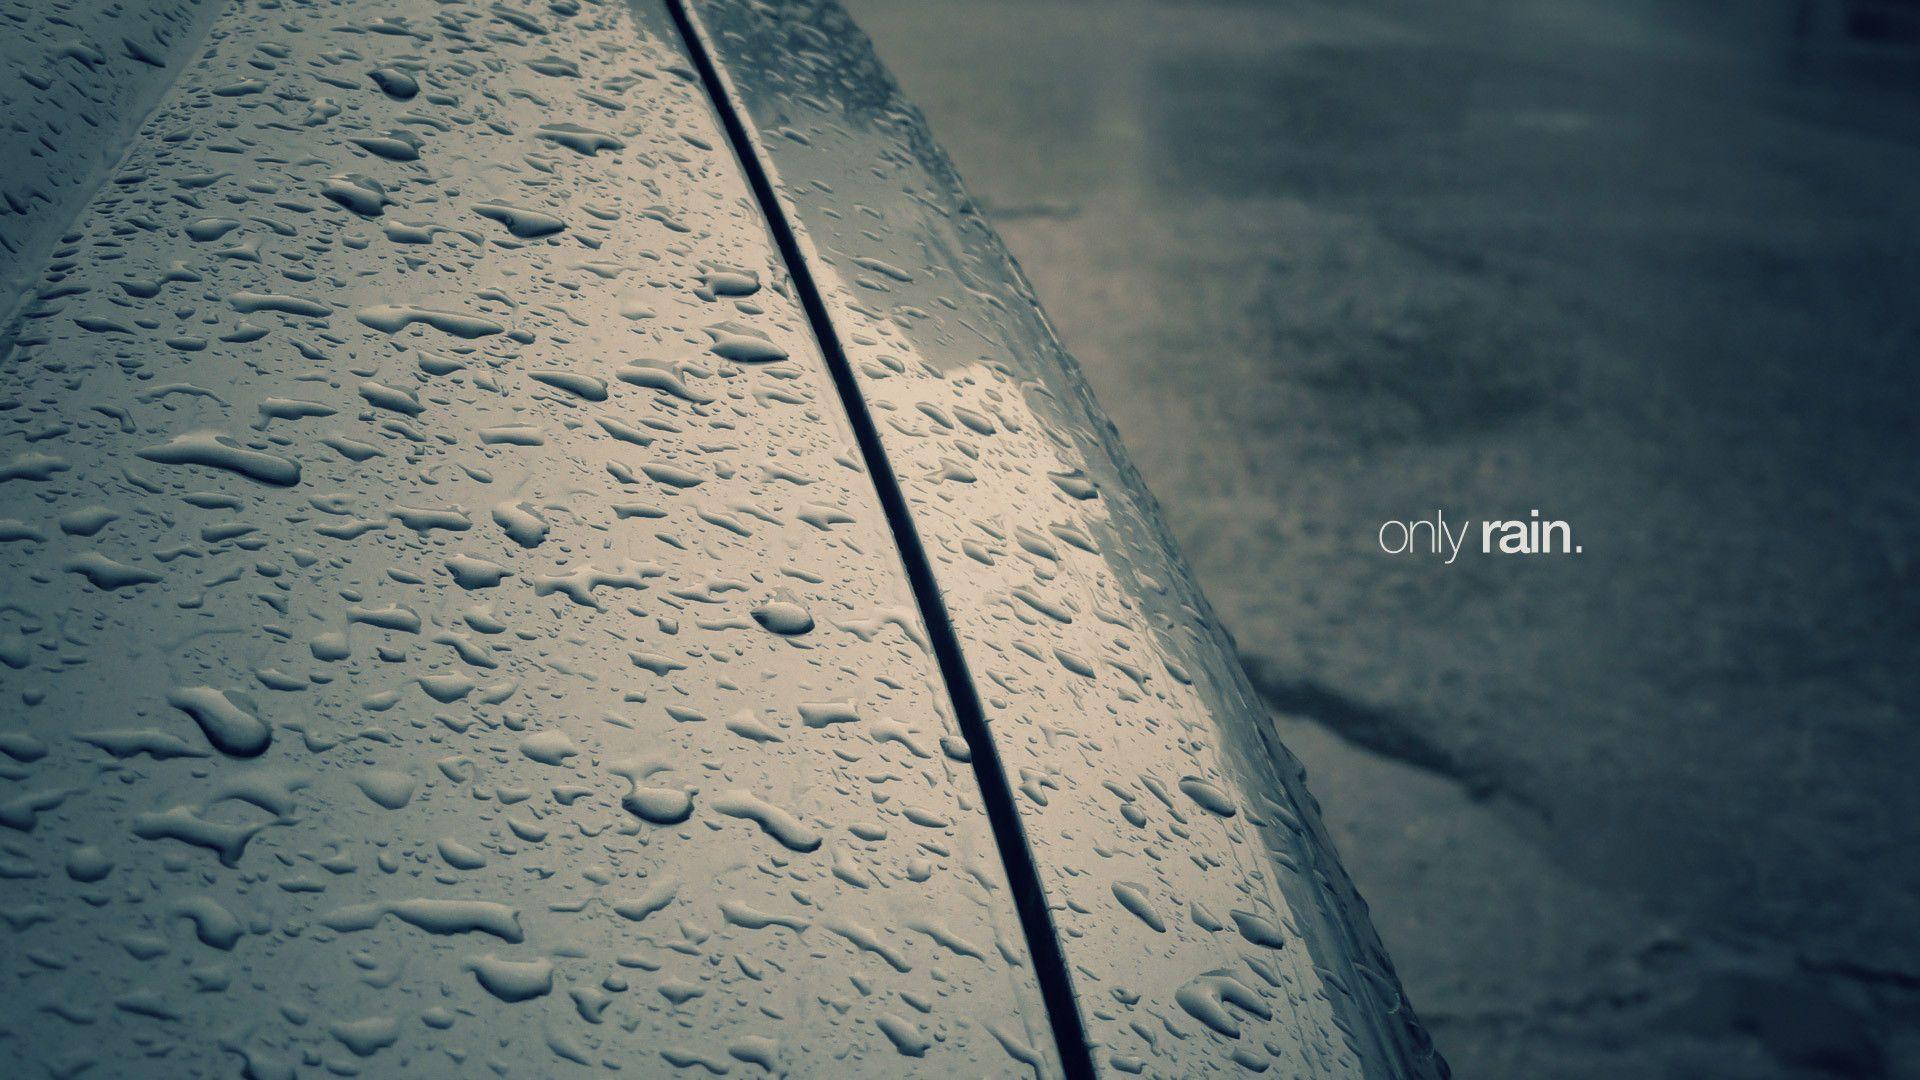 Only Rain HD Wallpaper | Theme Bin - Customization, HD Wallpapers ...